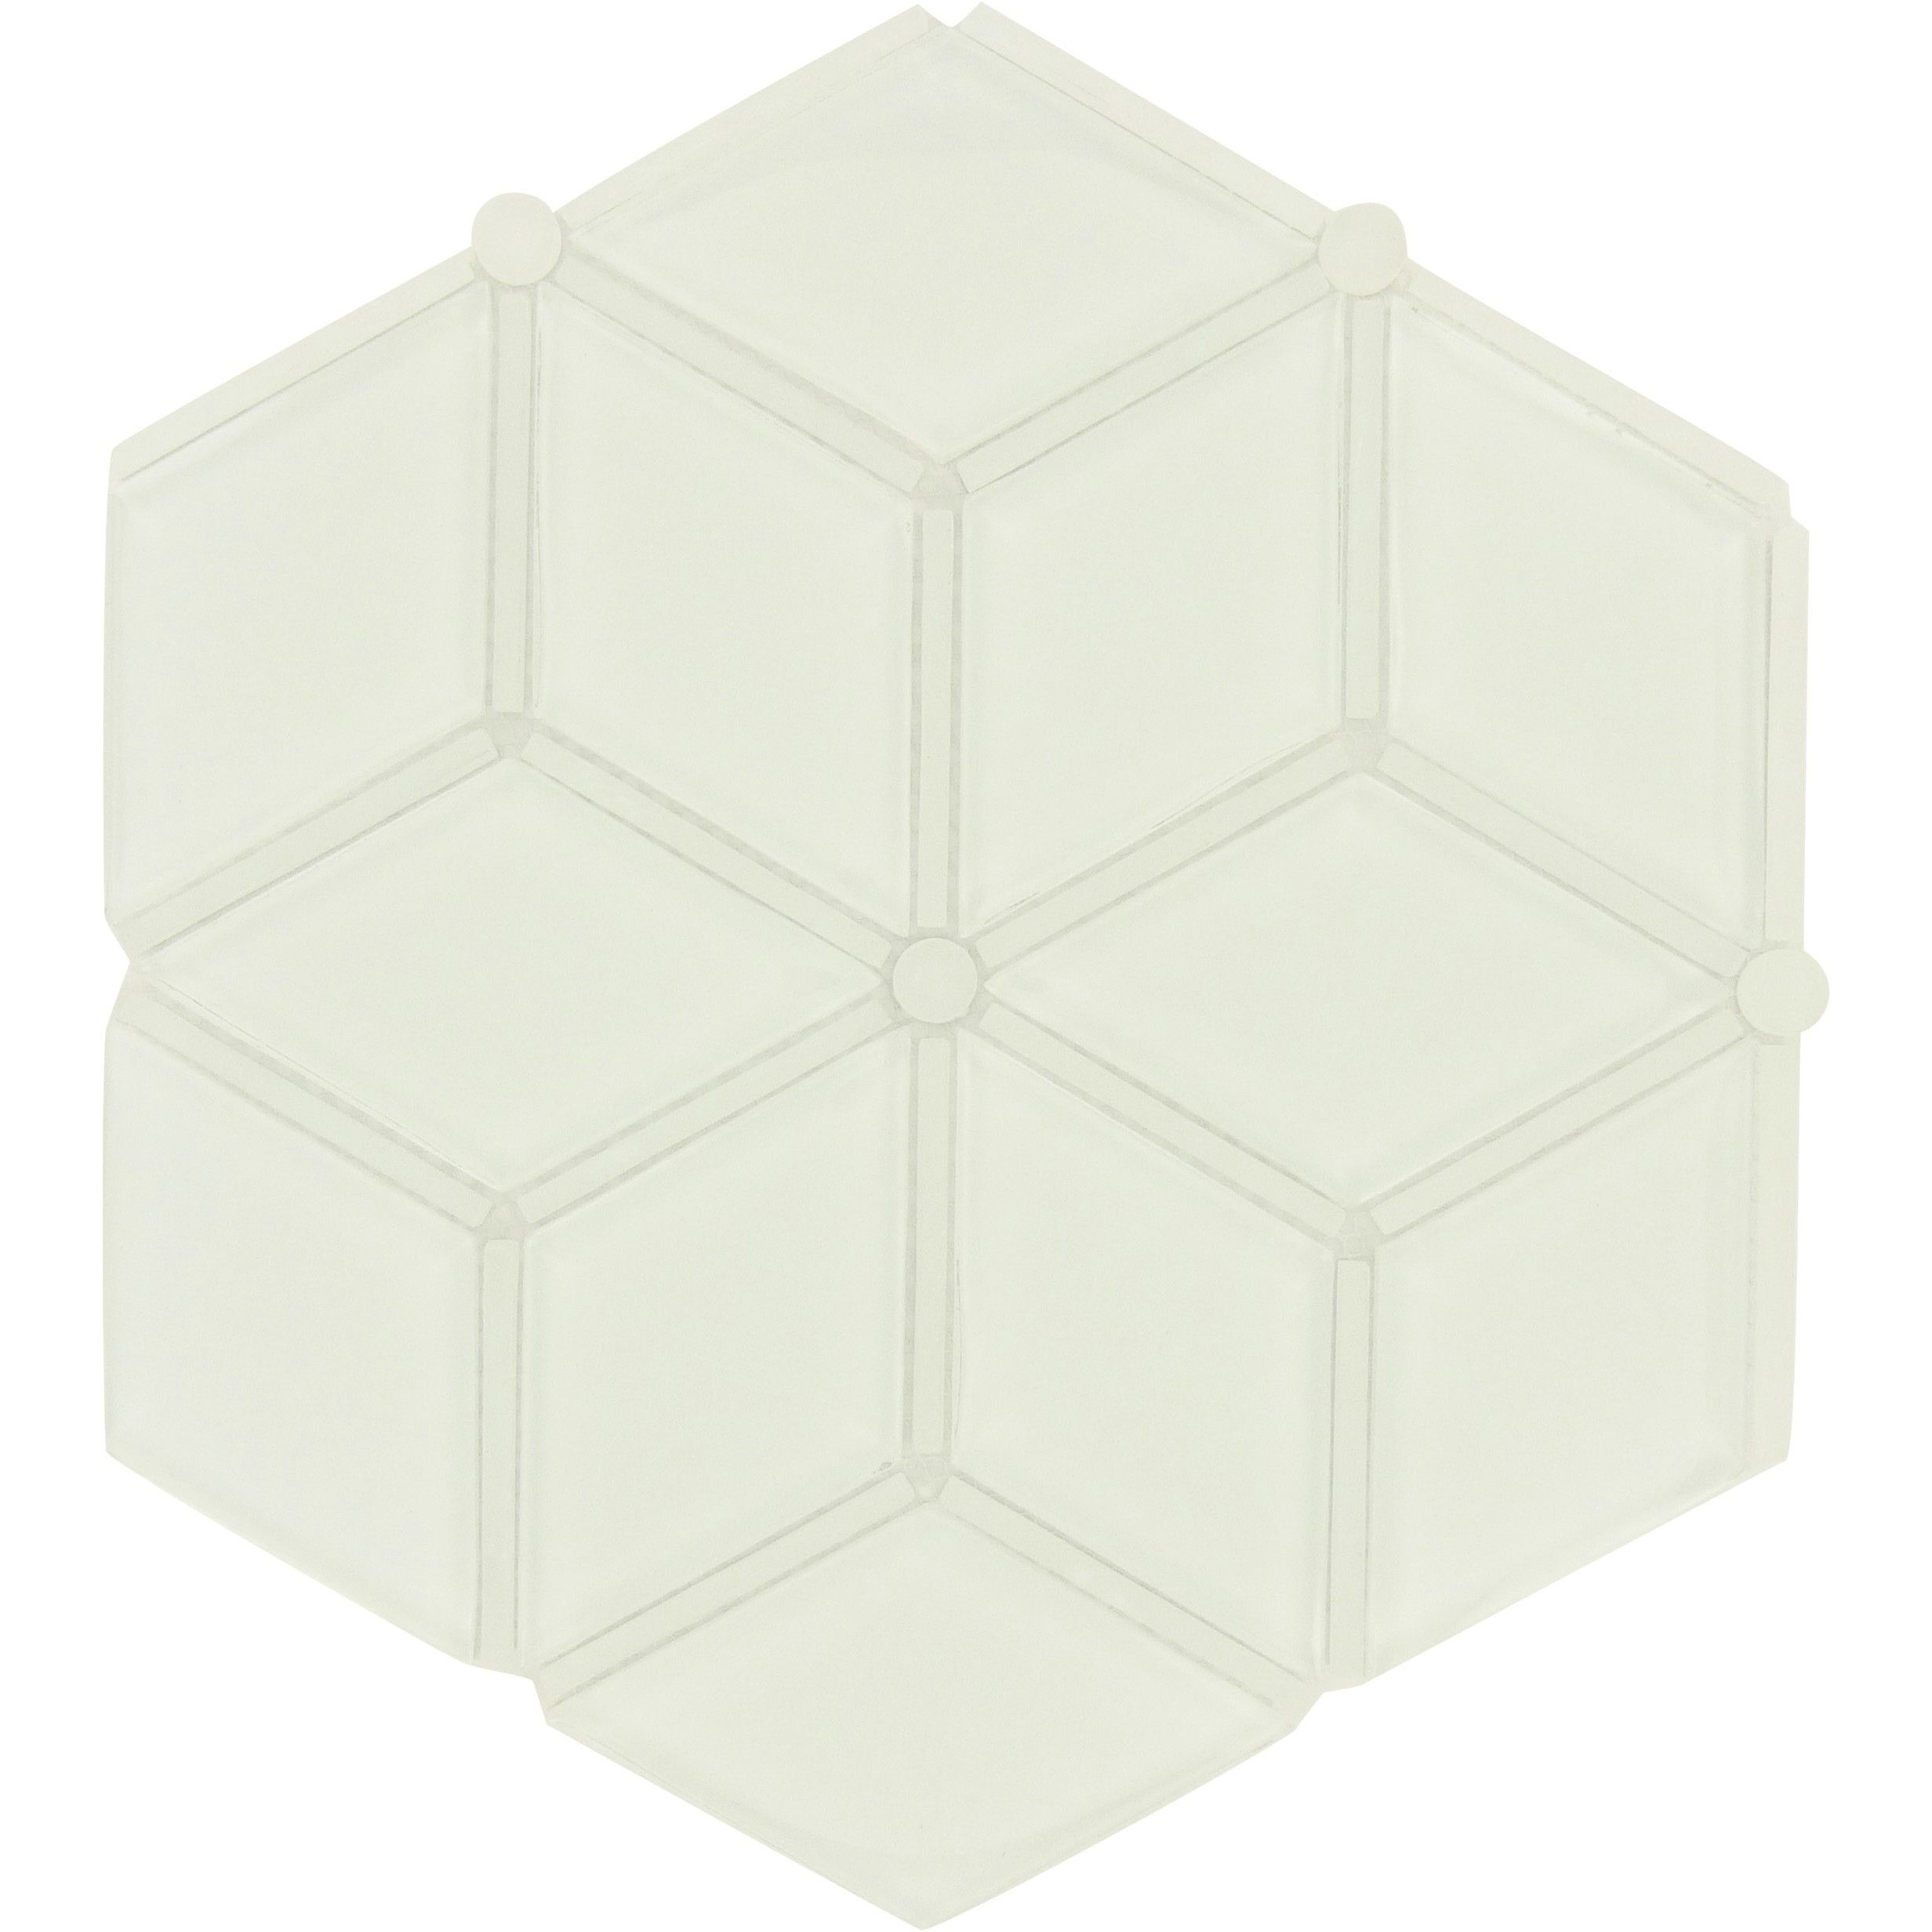 "Sheet Size: 10 3/4"" X 12"" Tile Size: Random Tile Thickness"